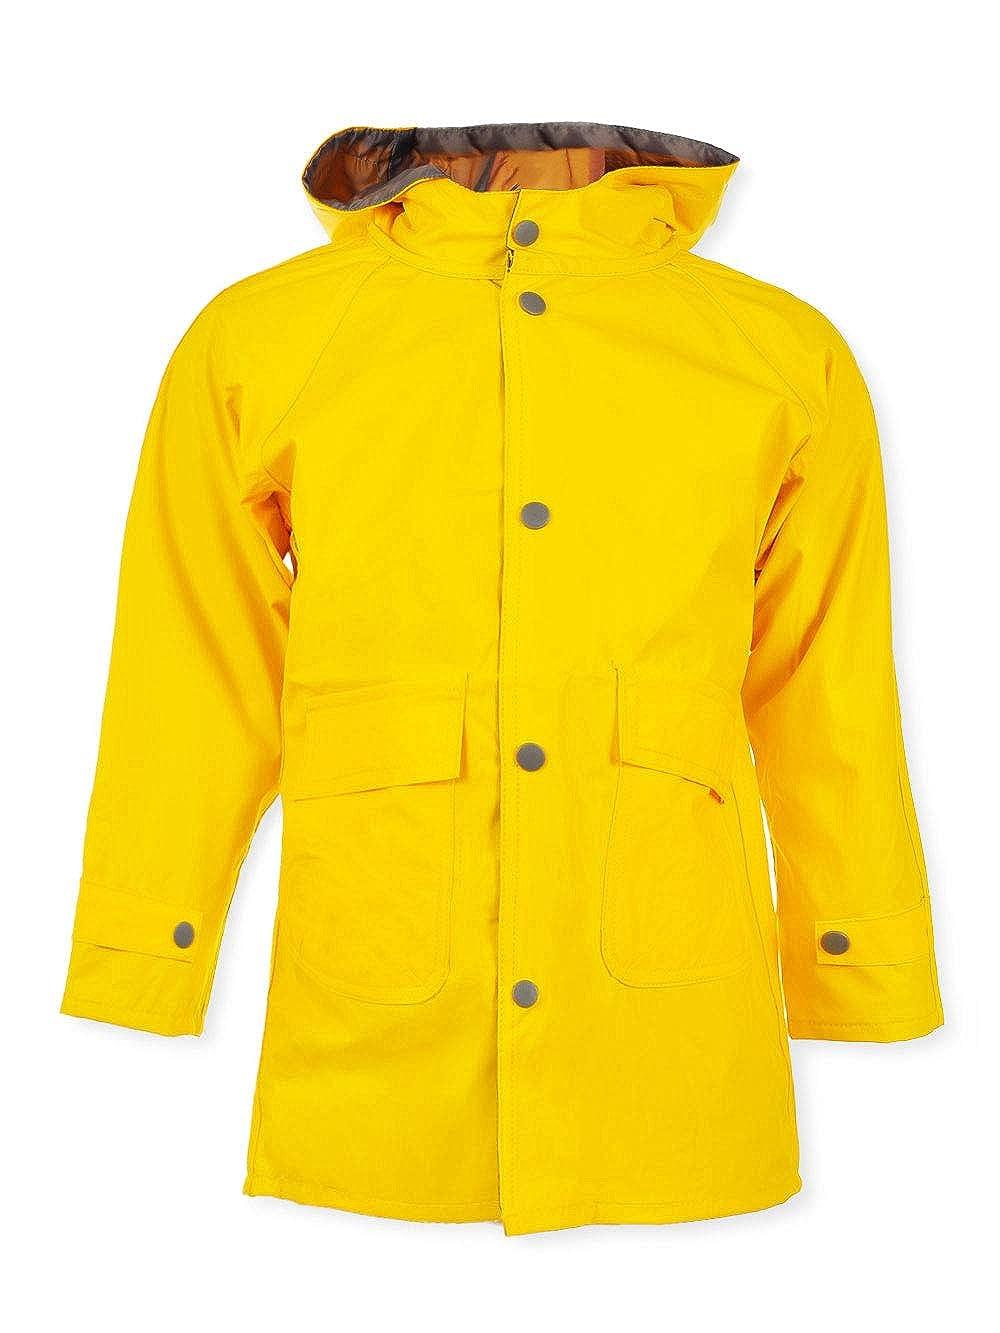 Wippette Unisex Raincoat Yellow 10-12